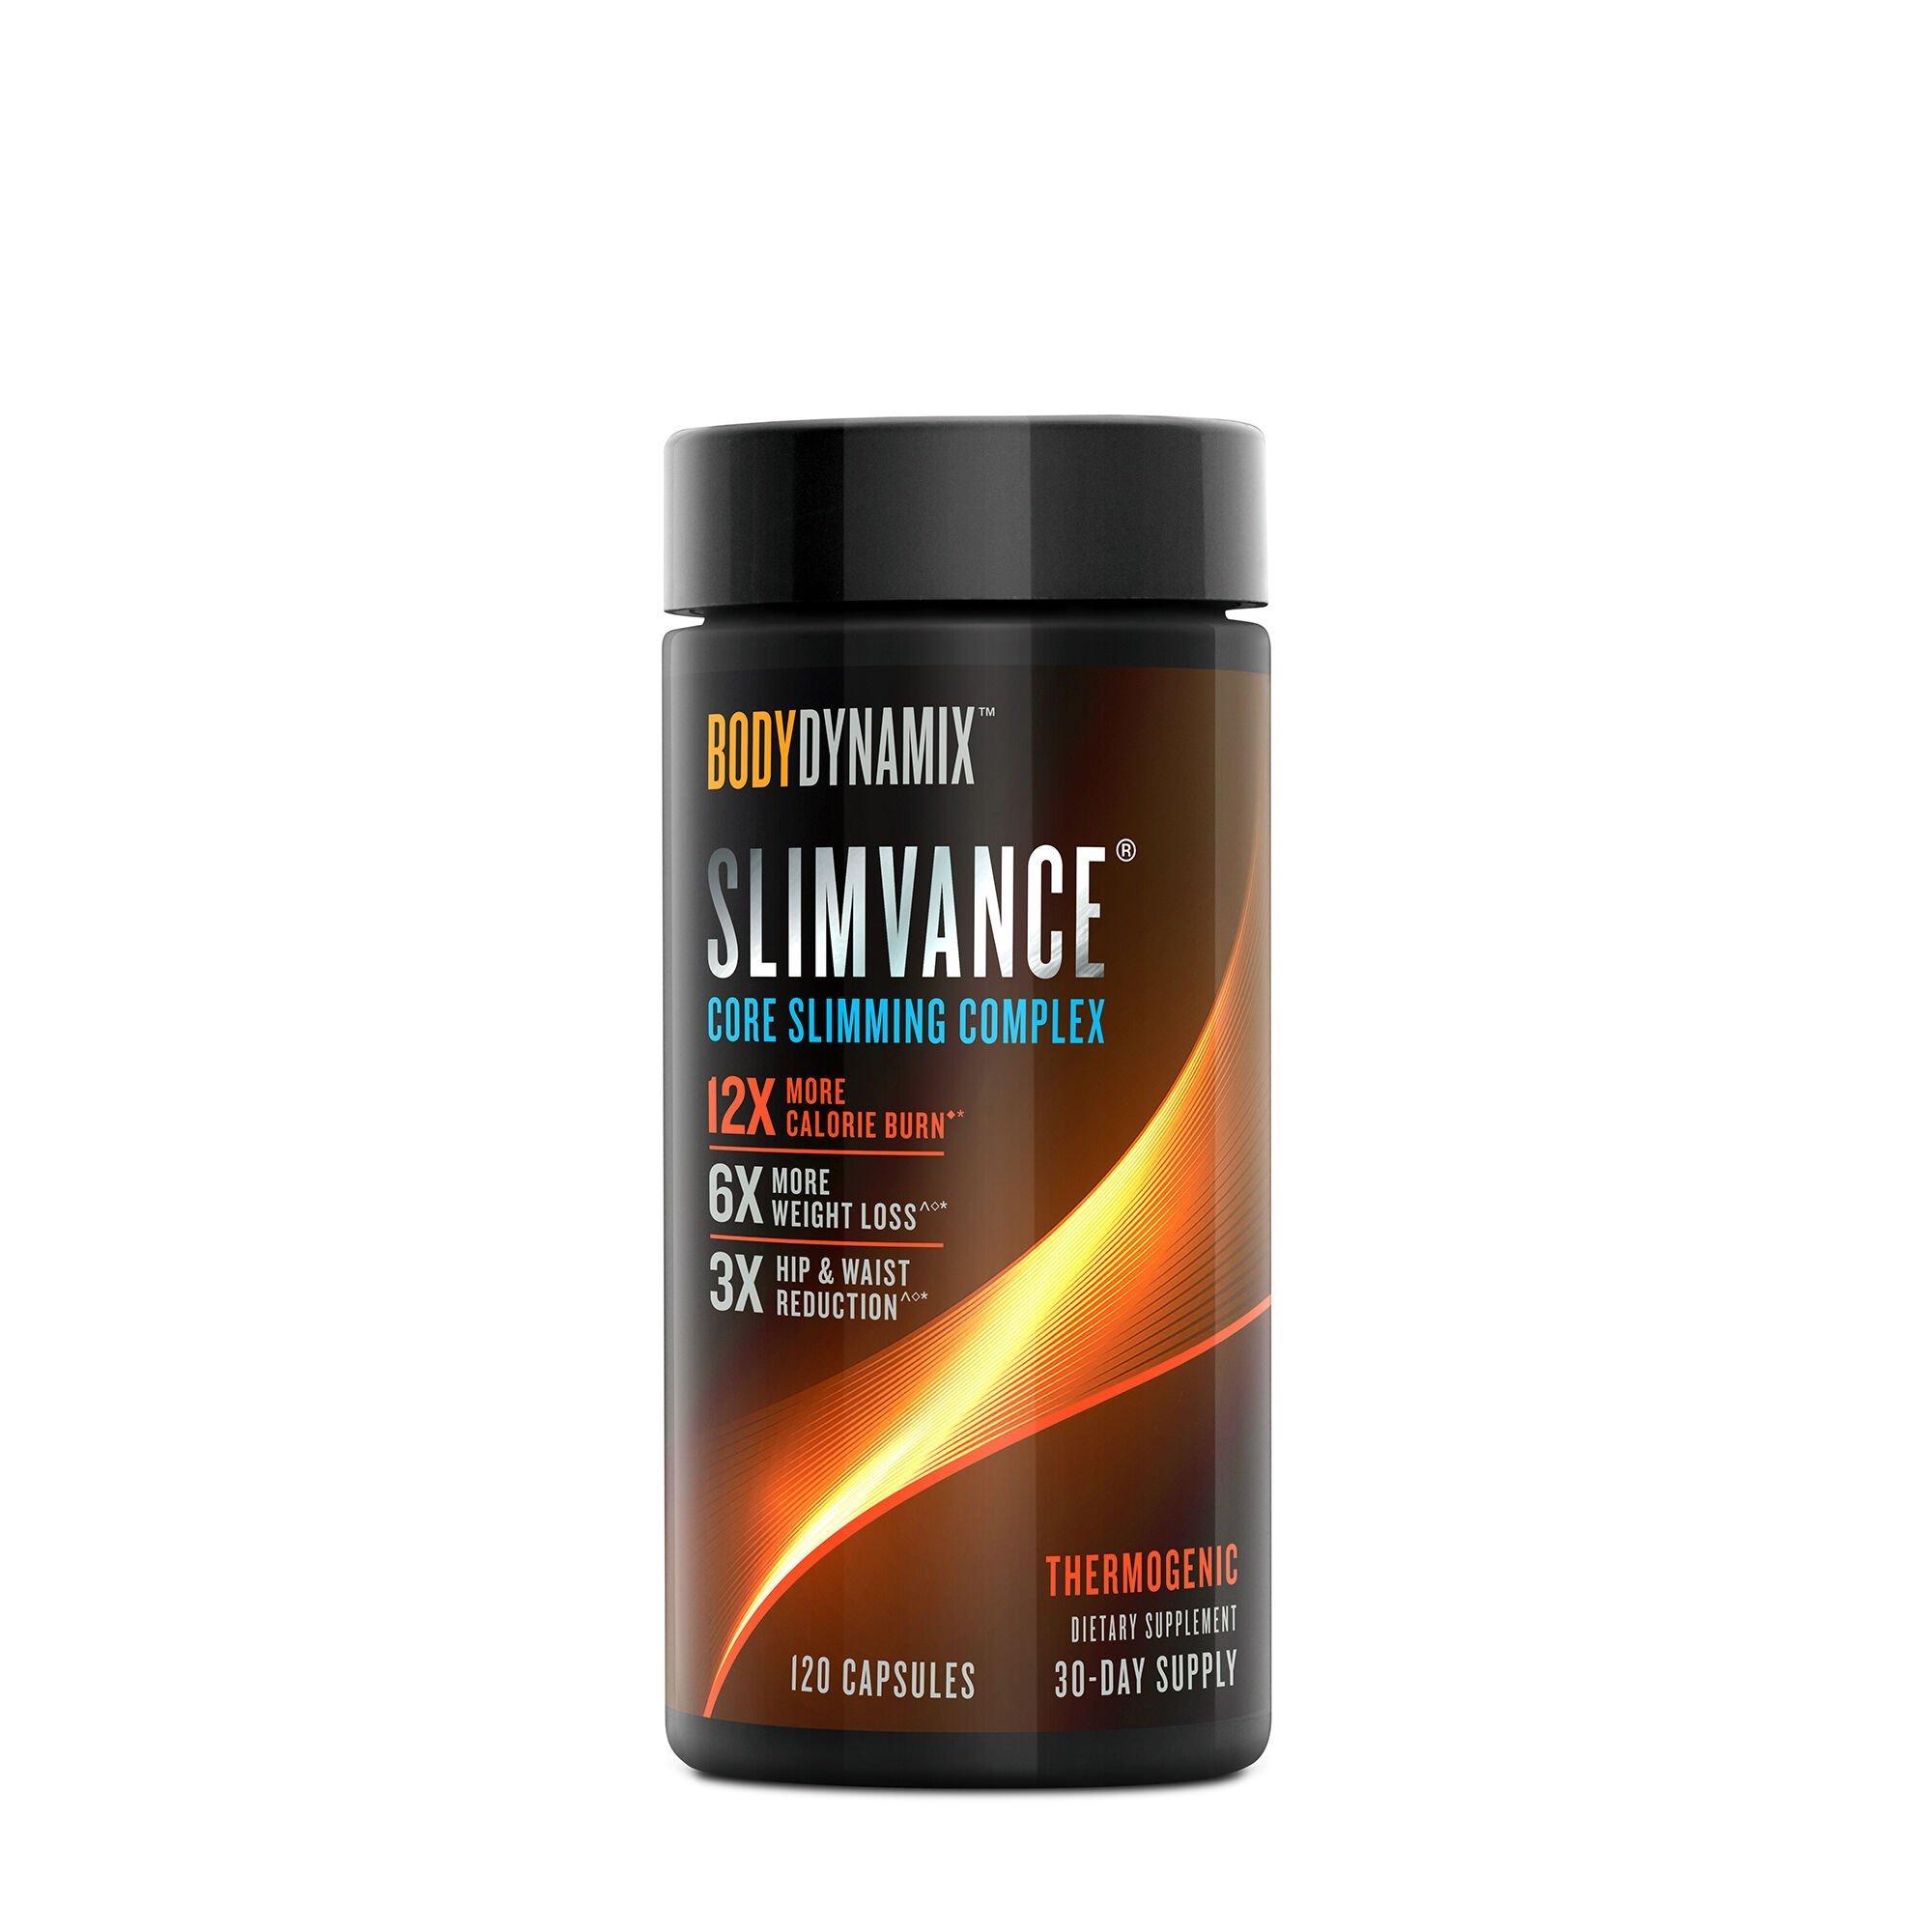 Slimvance® Core Slimming Complex Stimulant Free · 120 Caps